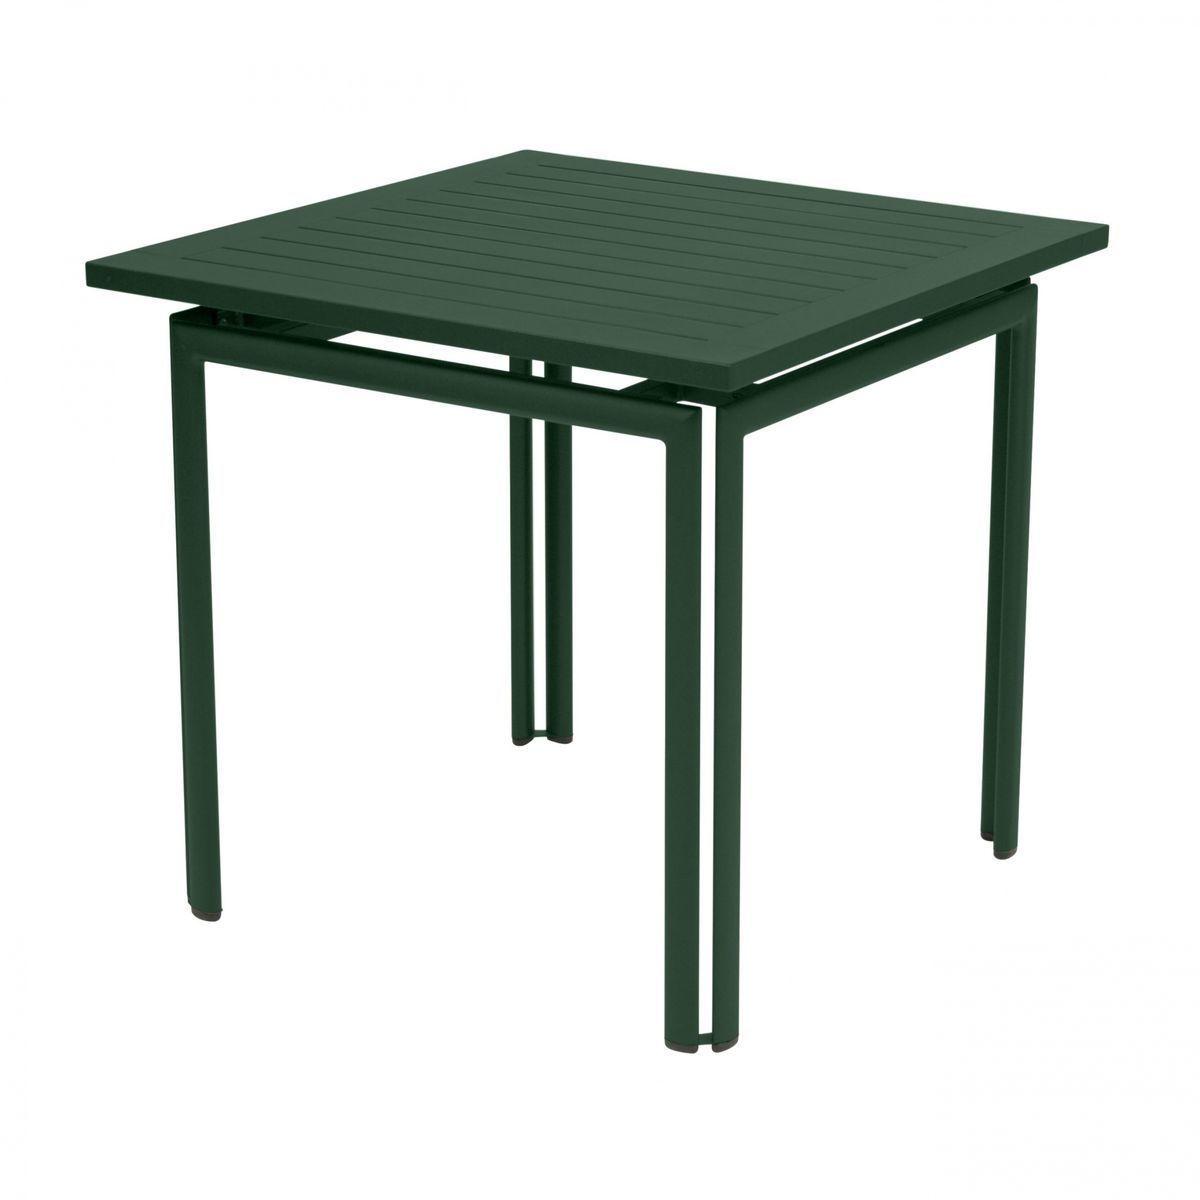 costa garden table square fermob. Black Bedroom Furniture Sets. Home Design Ideas